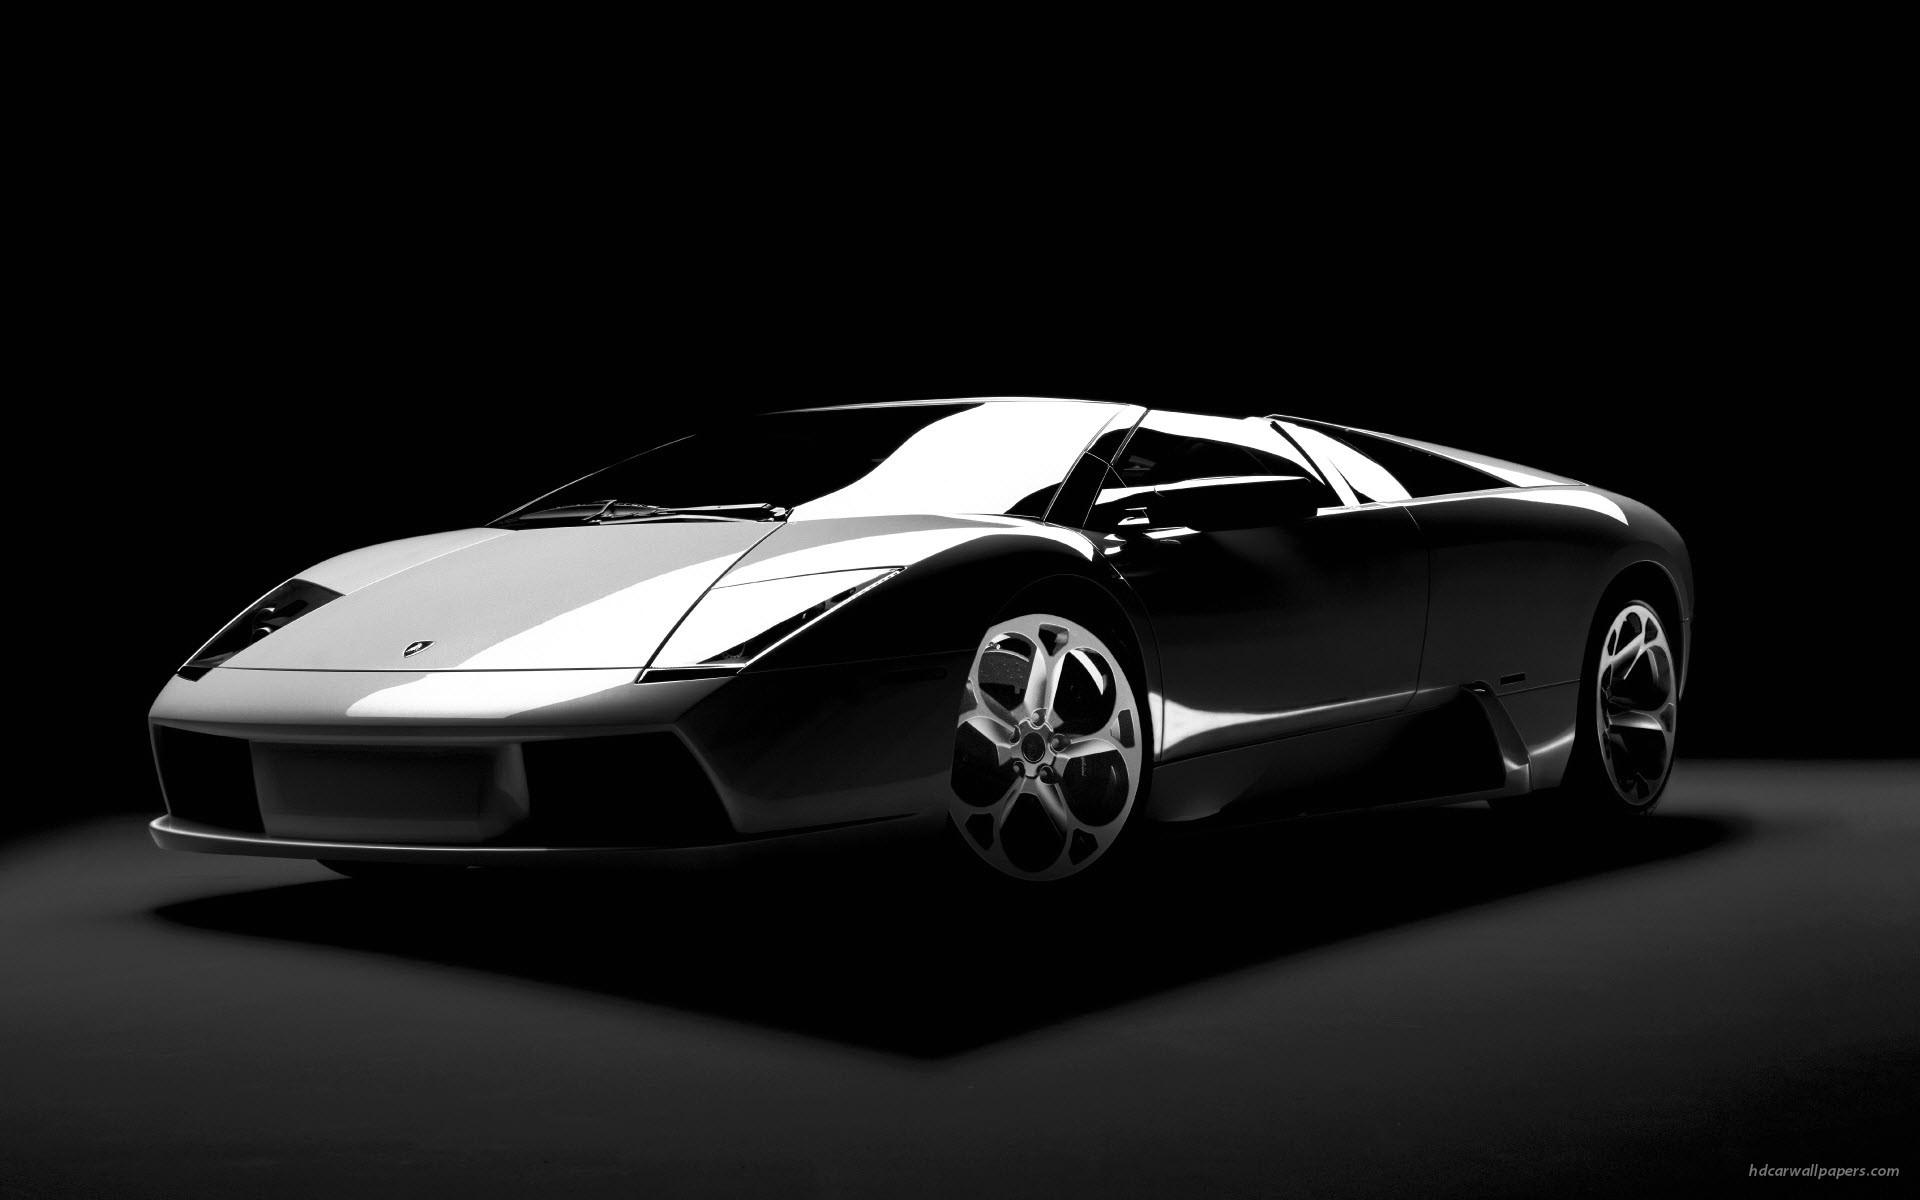 Hd wallpaper all - Lamborghini All New Wallpapers Hd Wallpapers